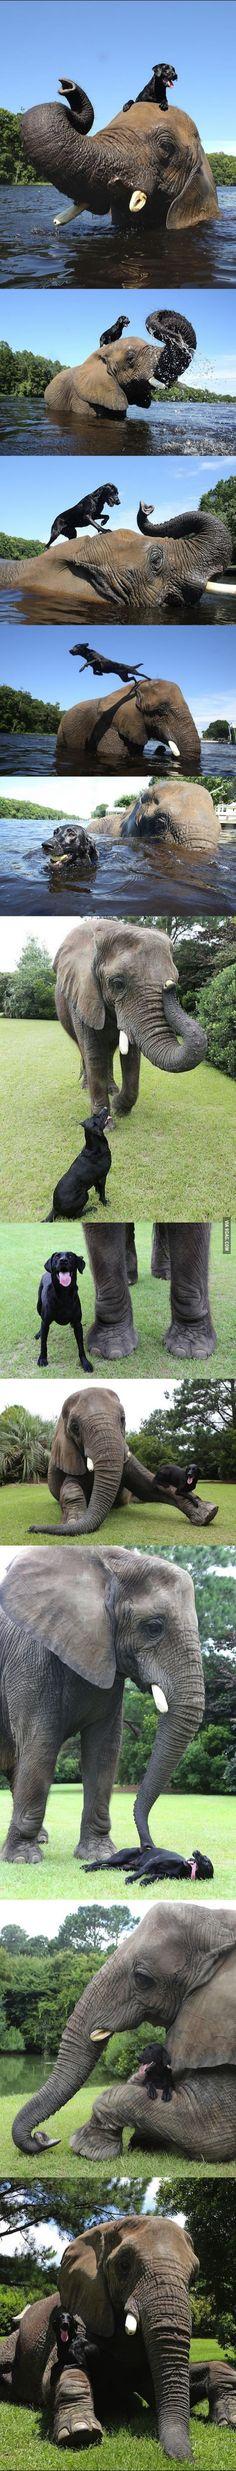 Elephant and dog, BFF